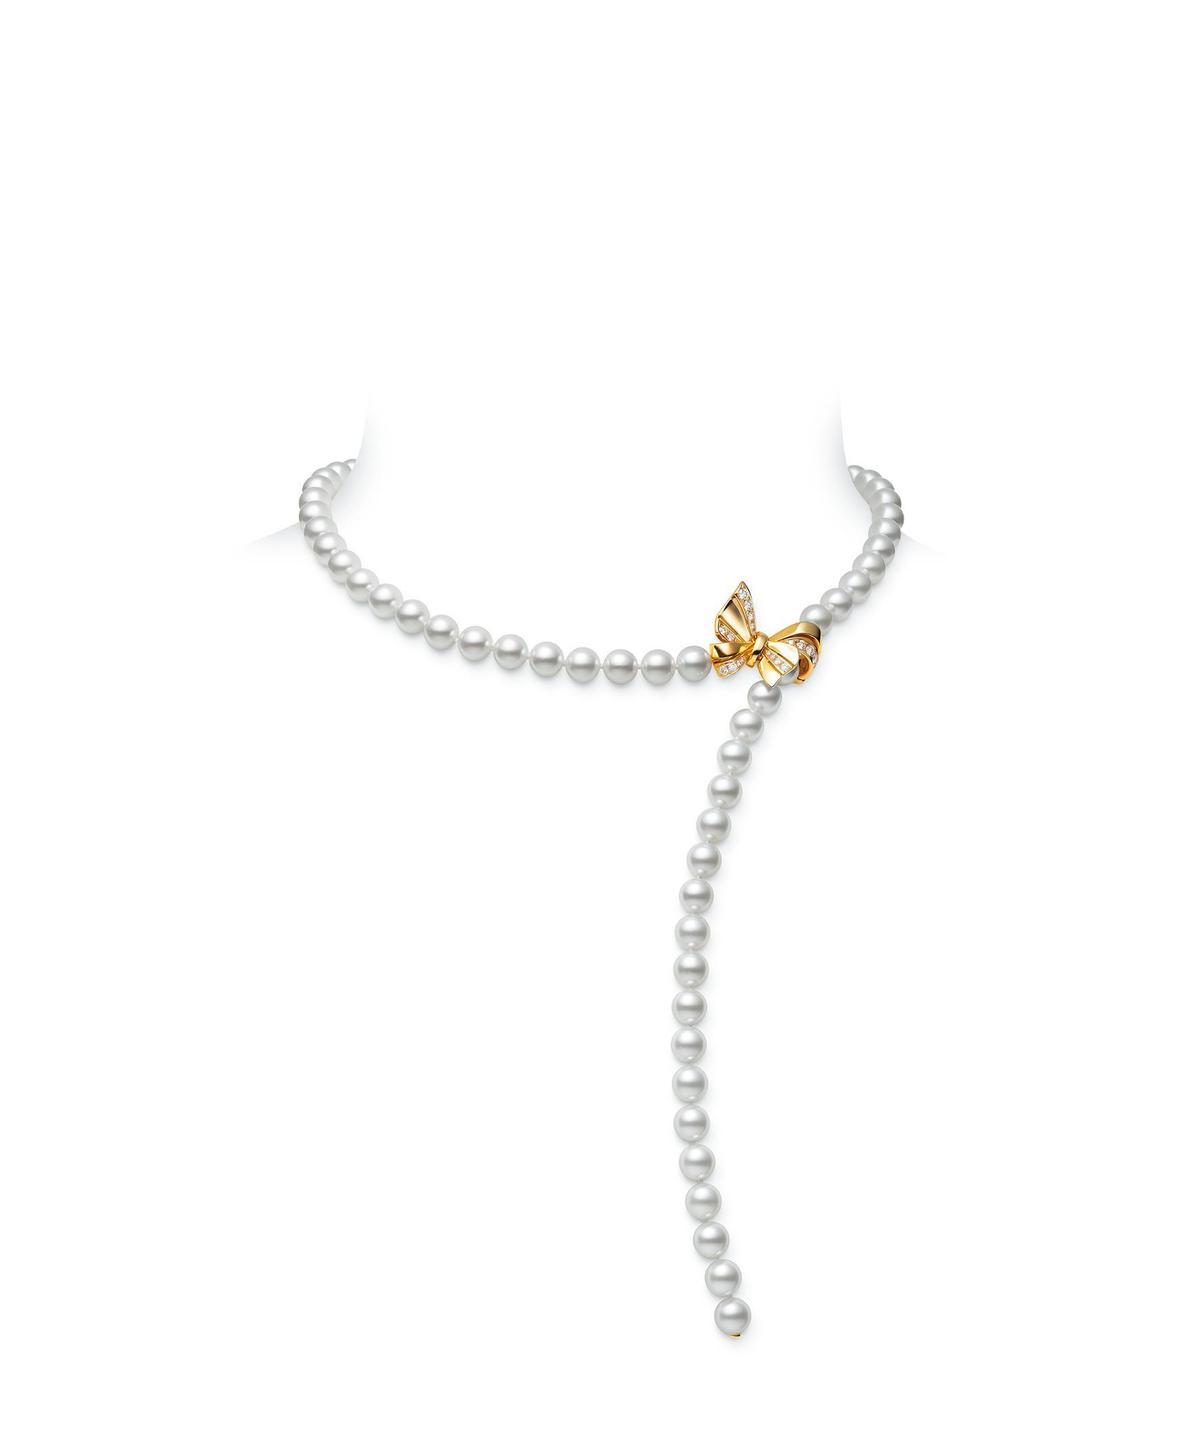 Jeux de Rubans系列珍珠串鍊18K黃金搭配日本Akoya珍珠、總重約0.41克拉鑽石。NT$288,000